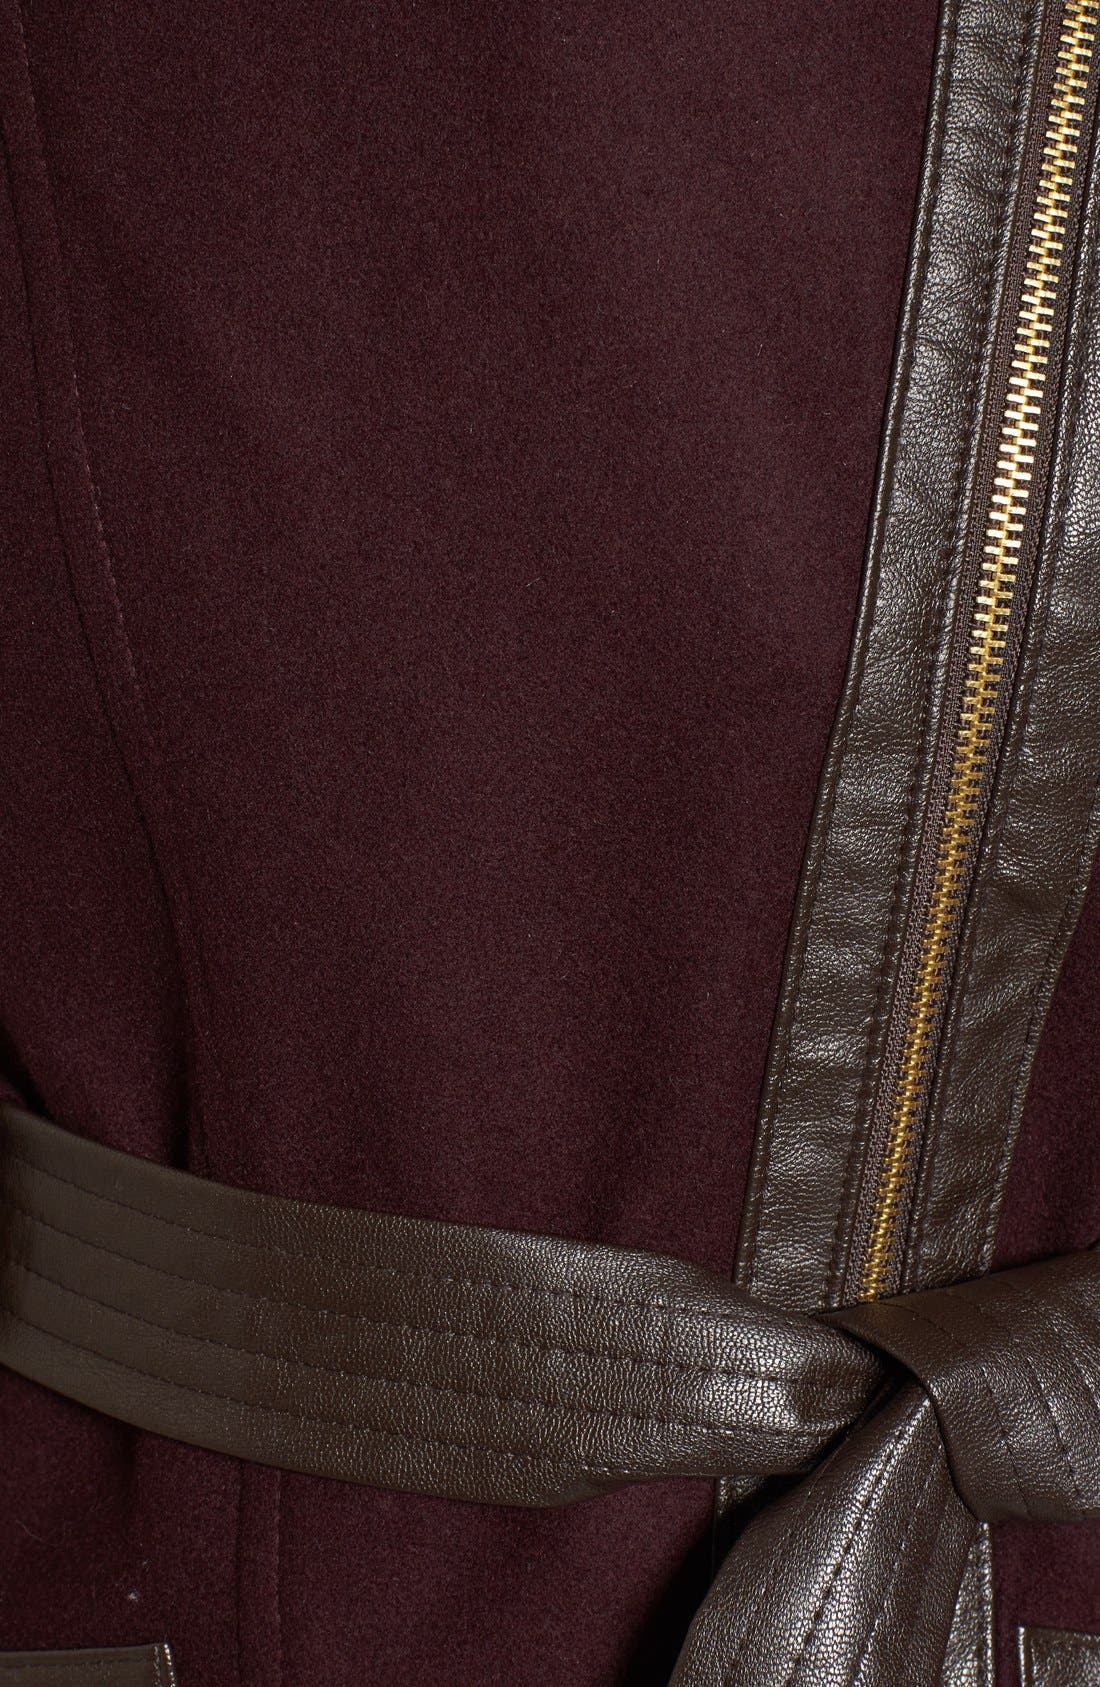 Faux Leather & Faux Fur Trim Belted Wool Blend Coat,                             Alternate thumbnail 38, color,